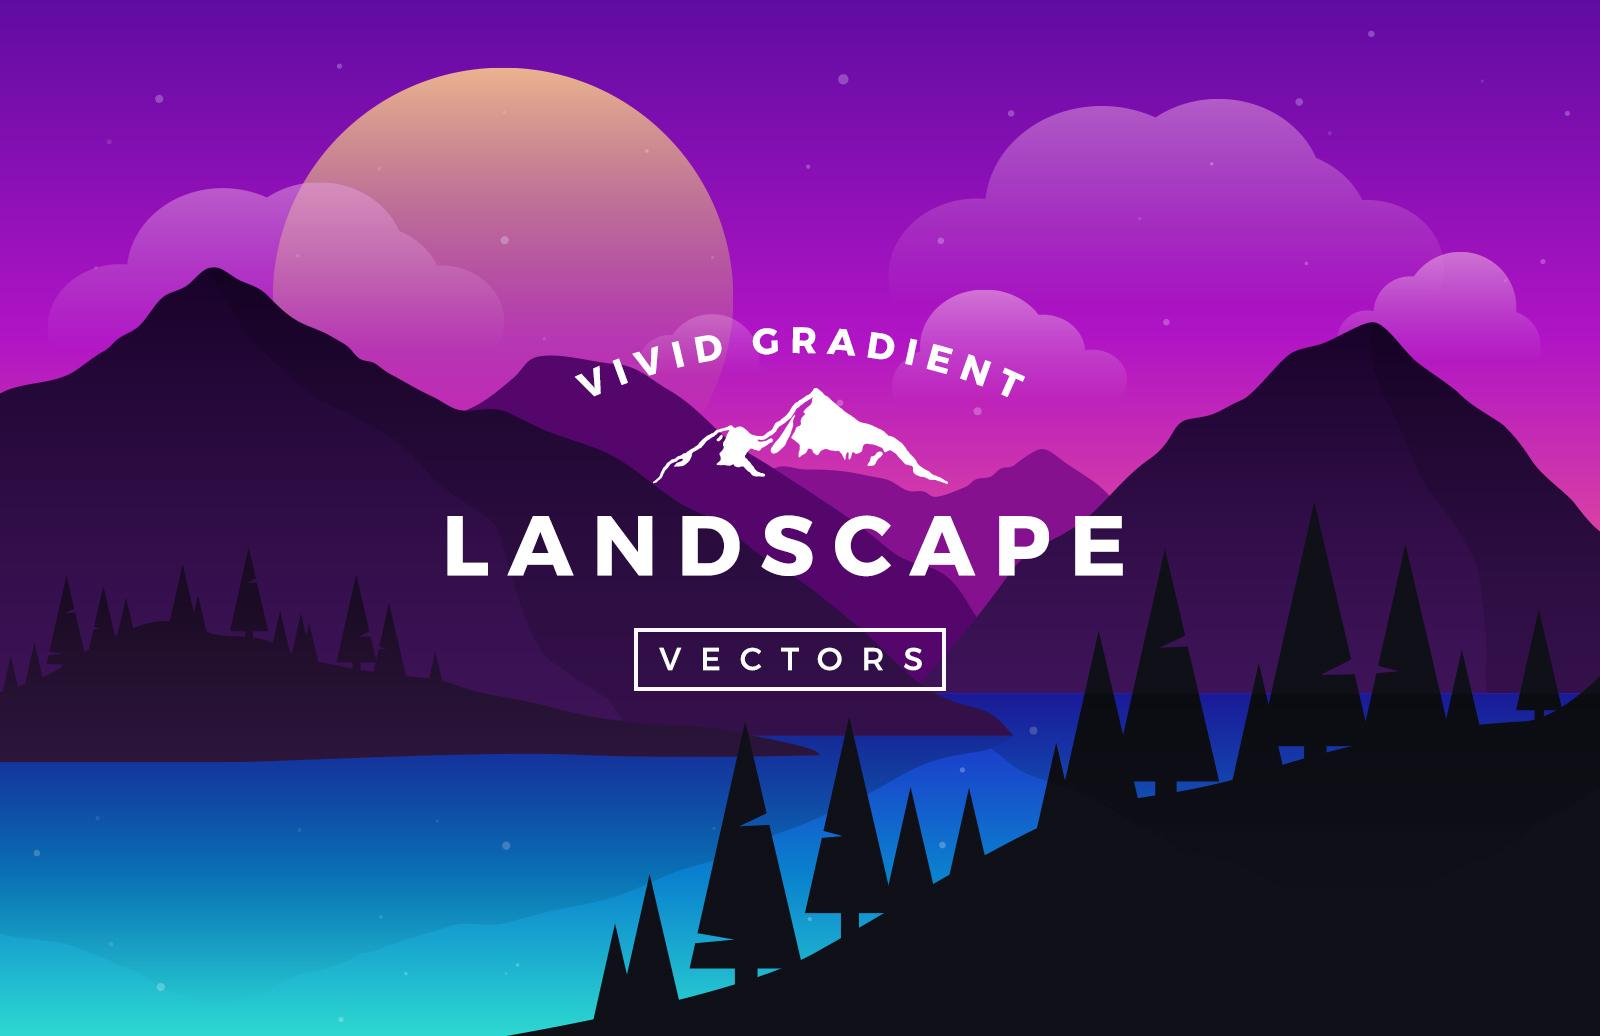 Vivid Gradient Vector Landscapes